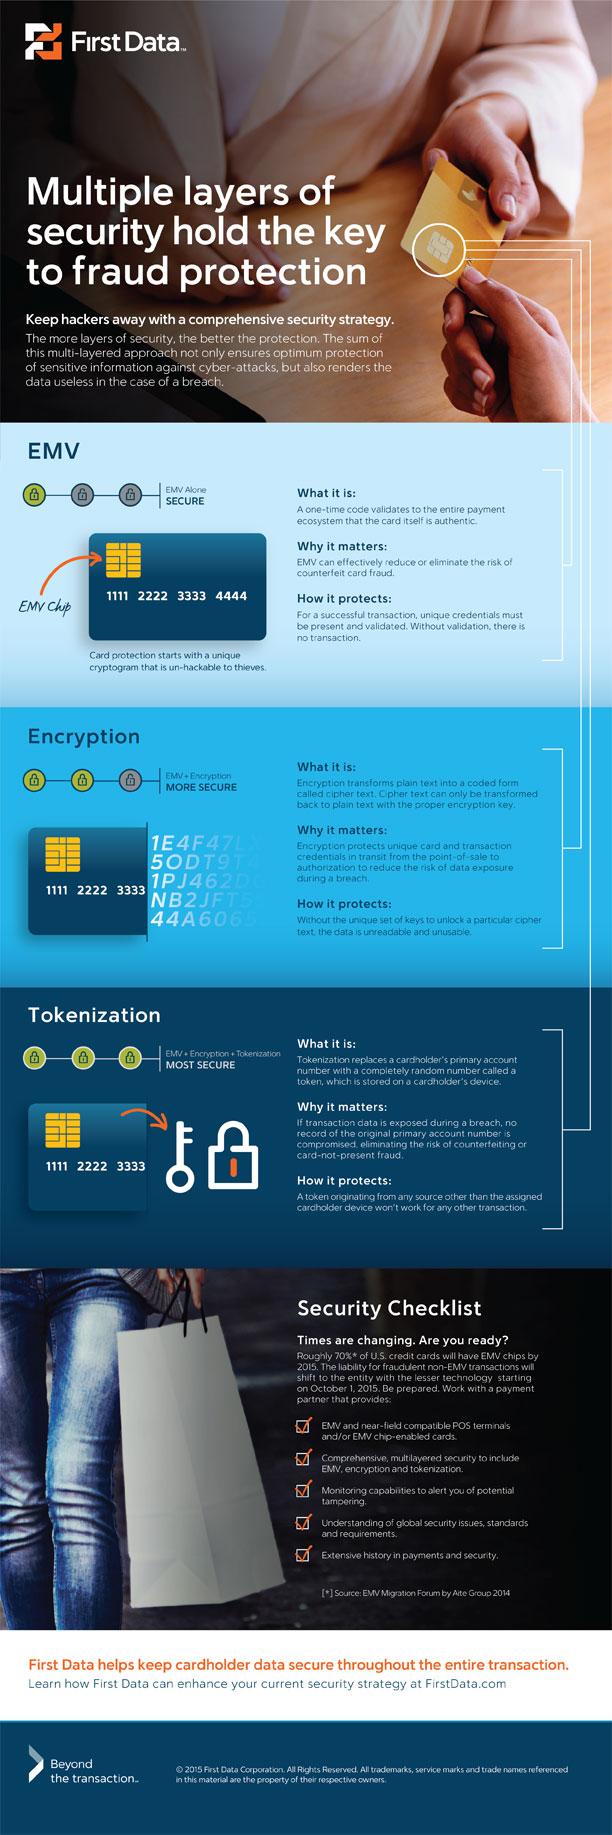 14-04110_FDAT_IG_EMV-Tokenization-Security-Infographic-final